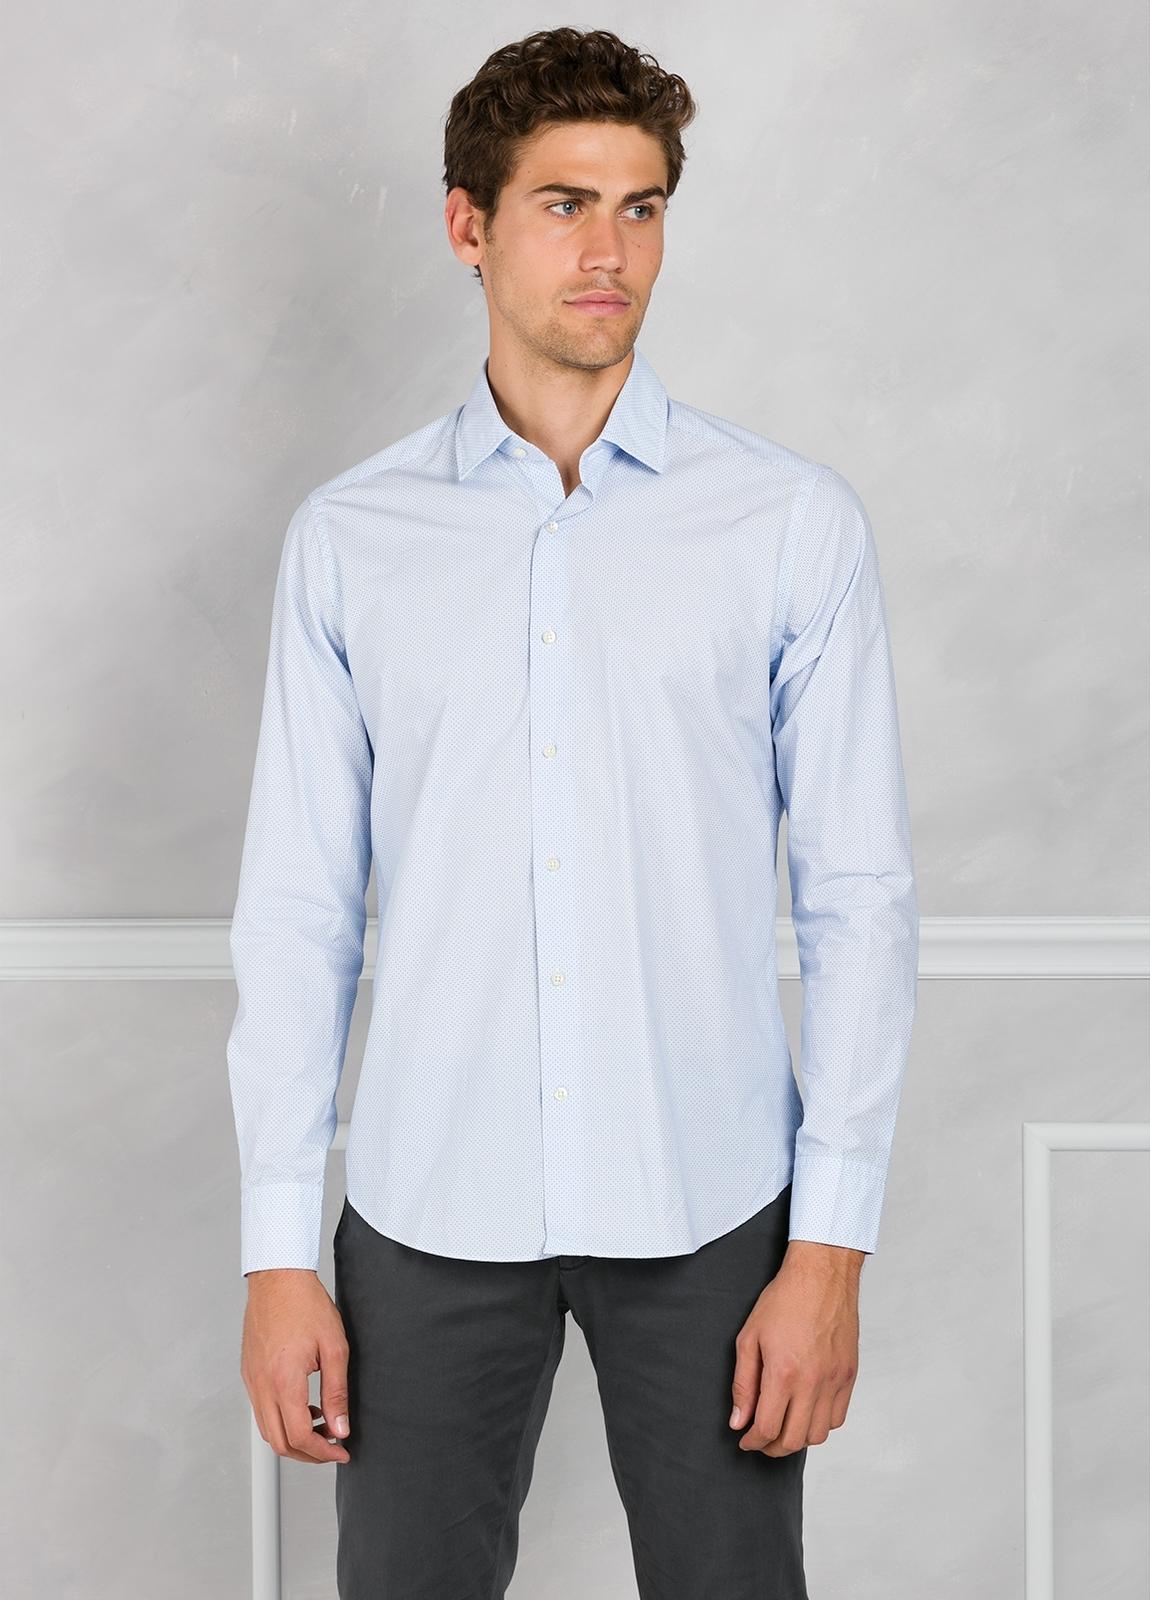 Camisa Leisure Wear REGULAR FIT modelo PORTO microdibujo color azul. 100% Algodón. - Ítem3